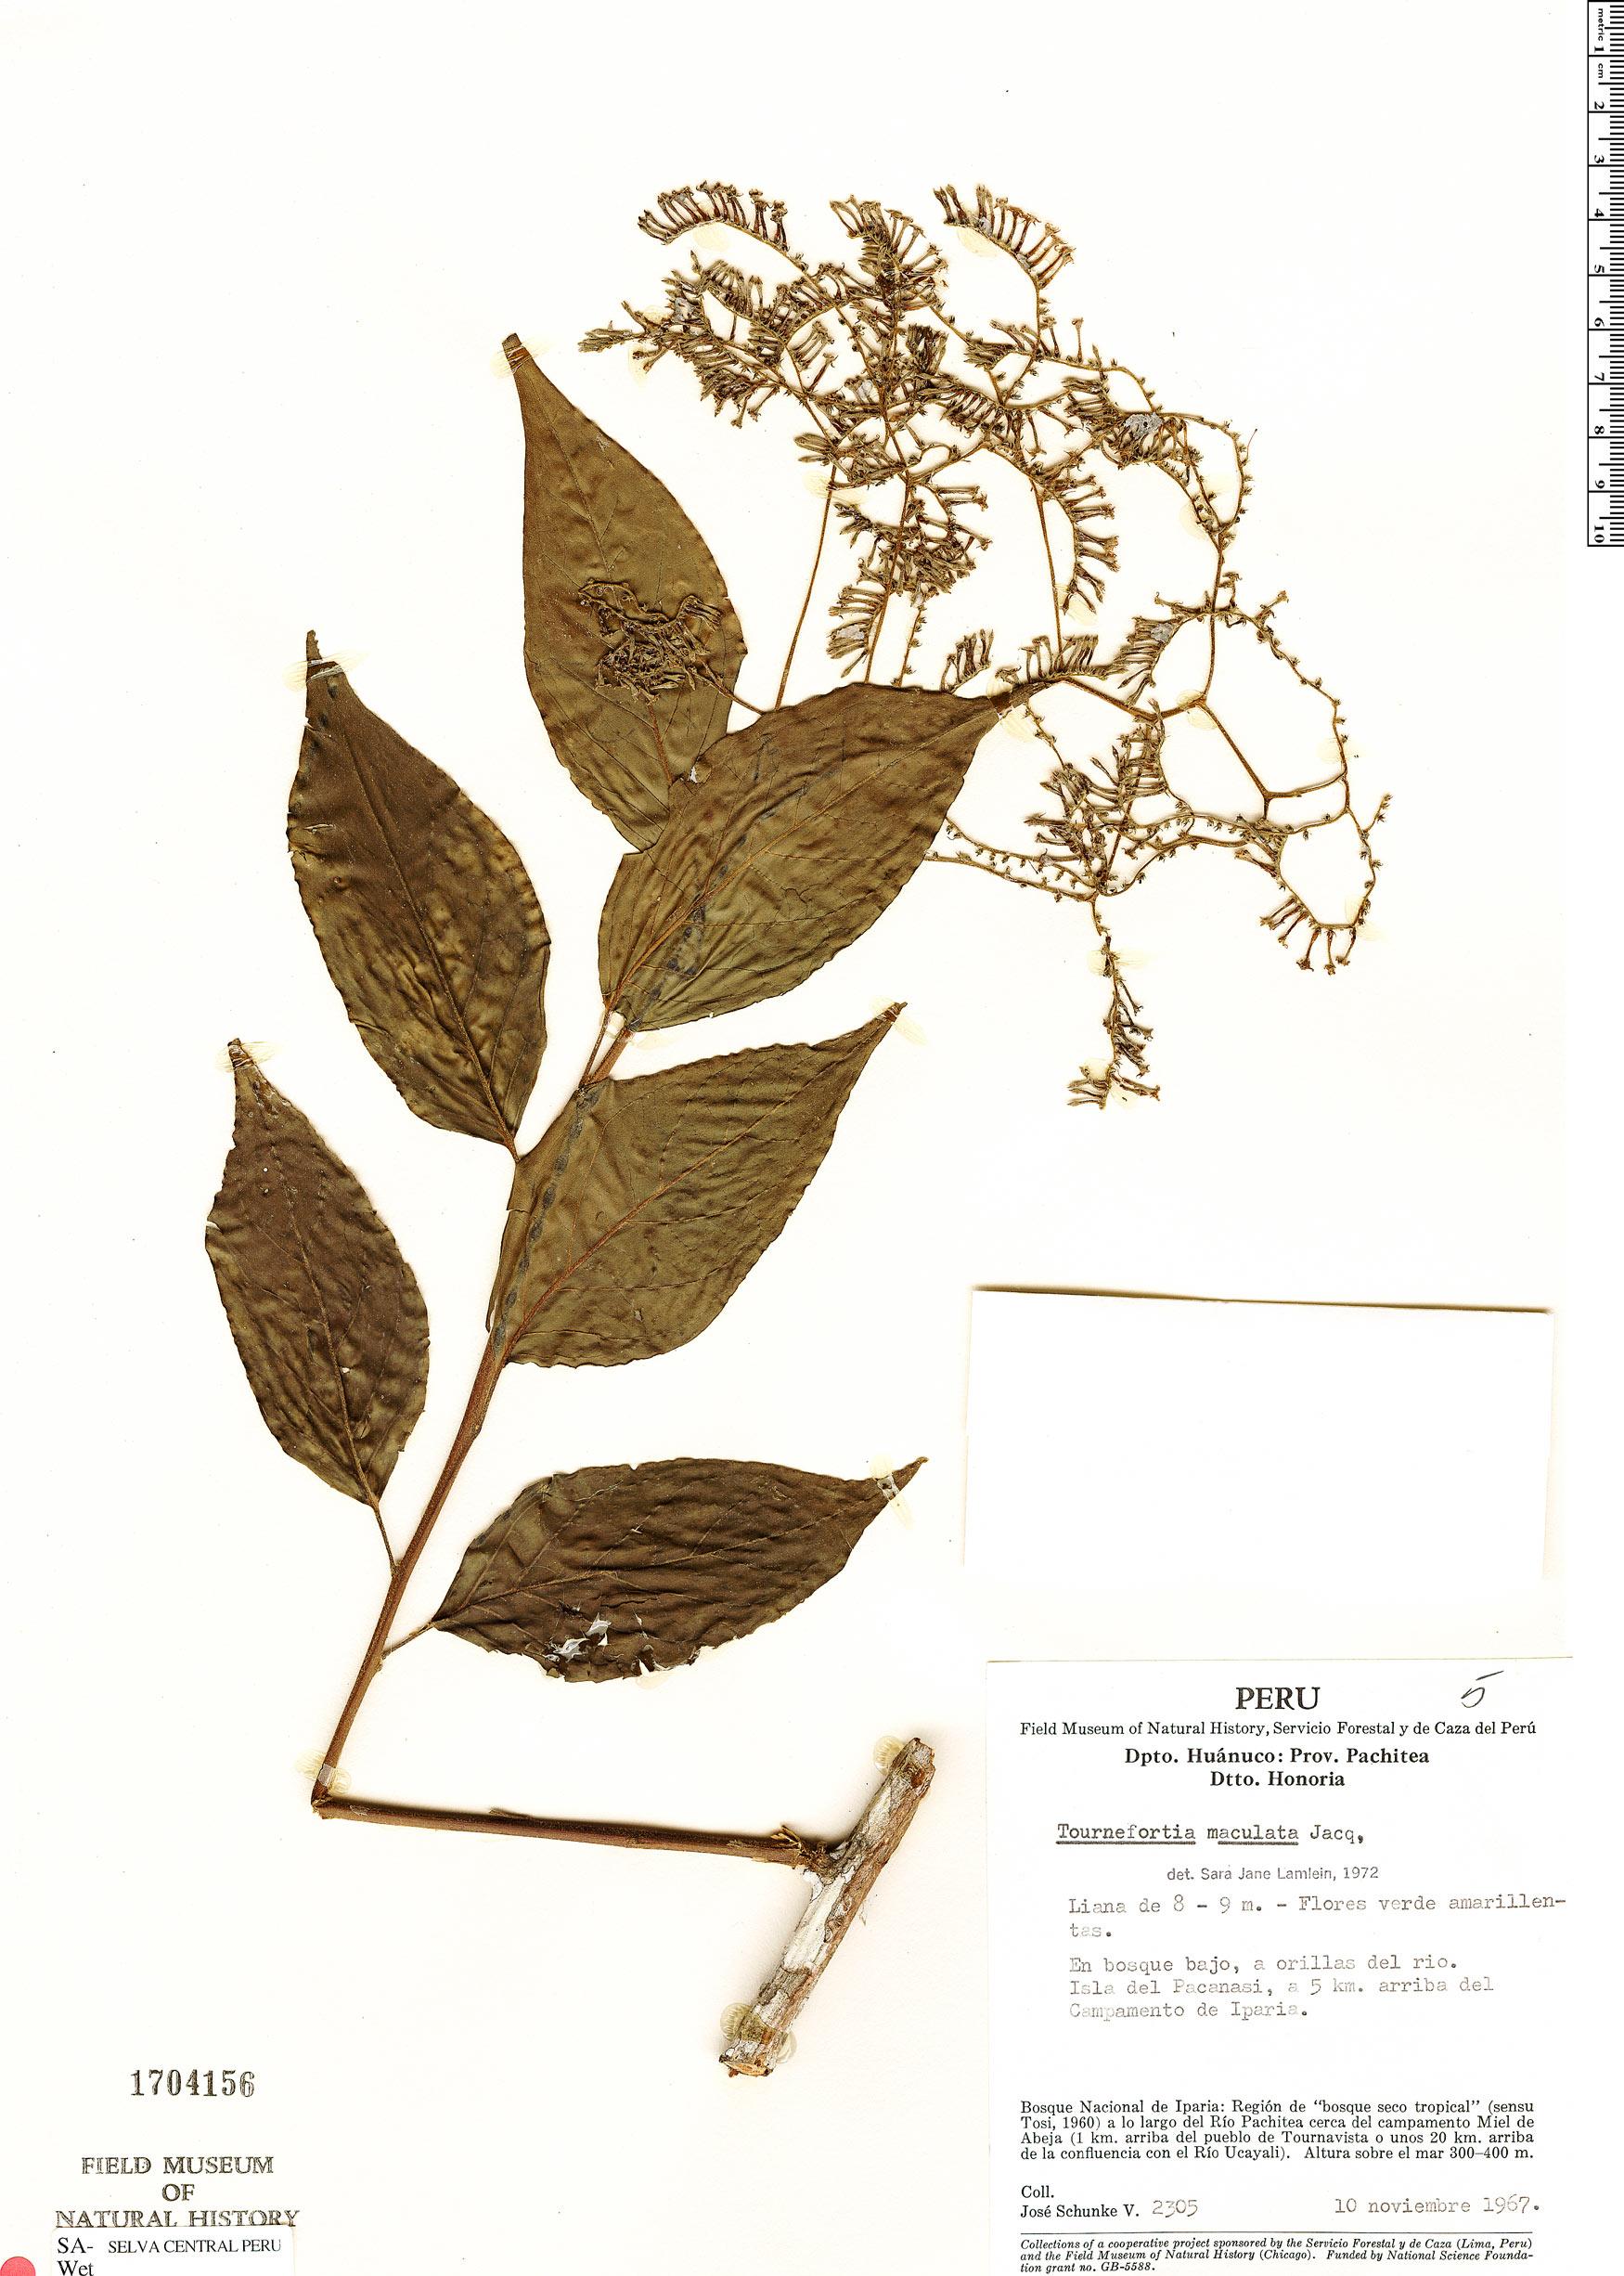 Specimen: Tournefortia maculata